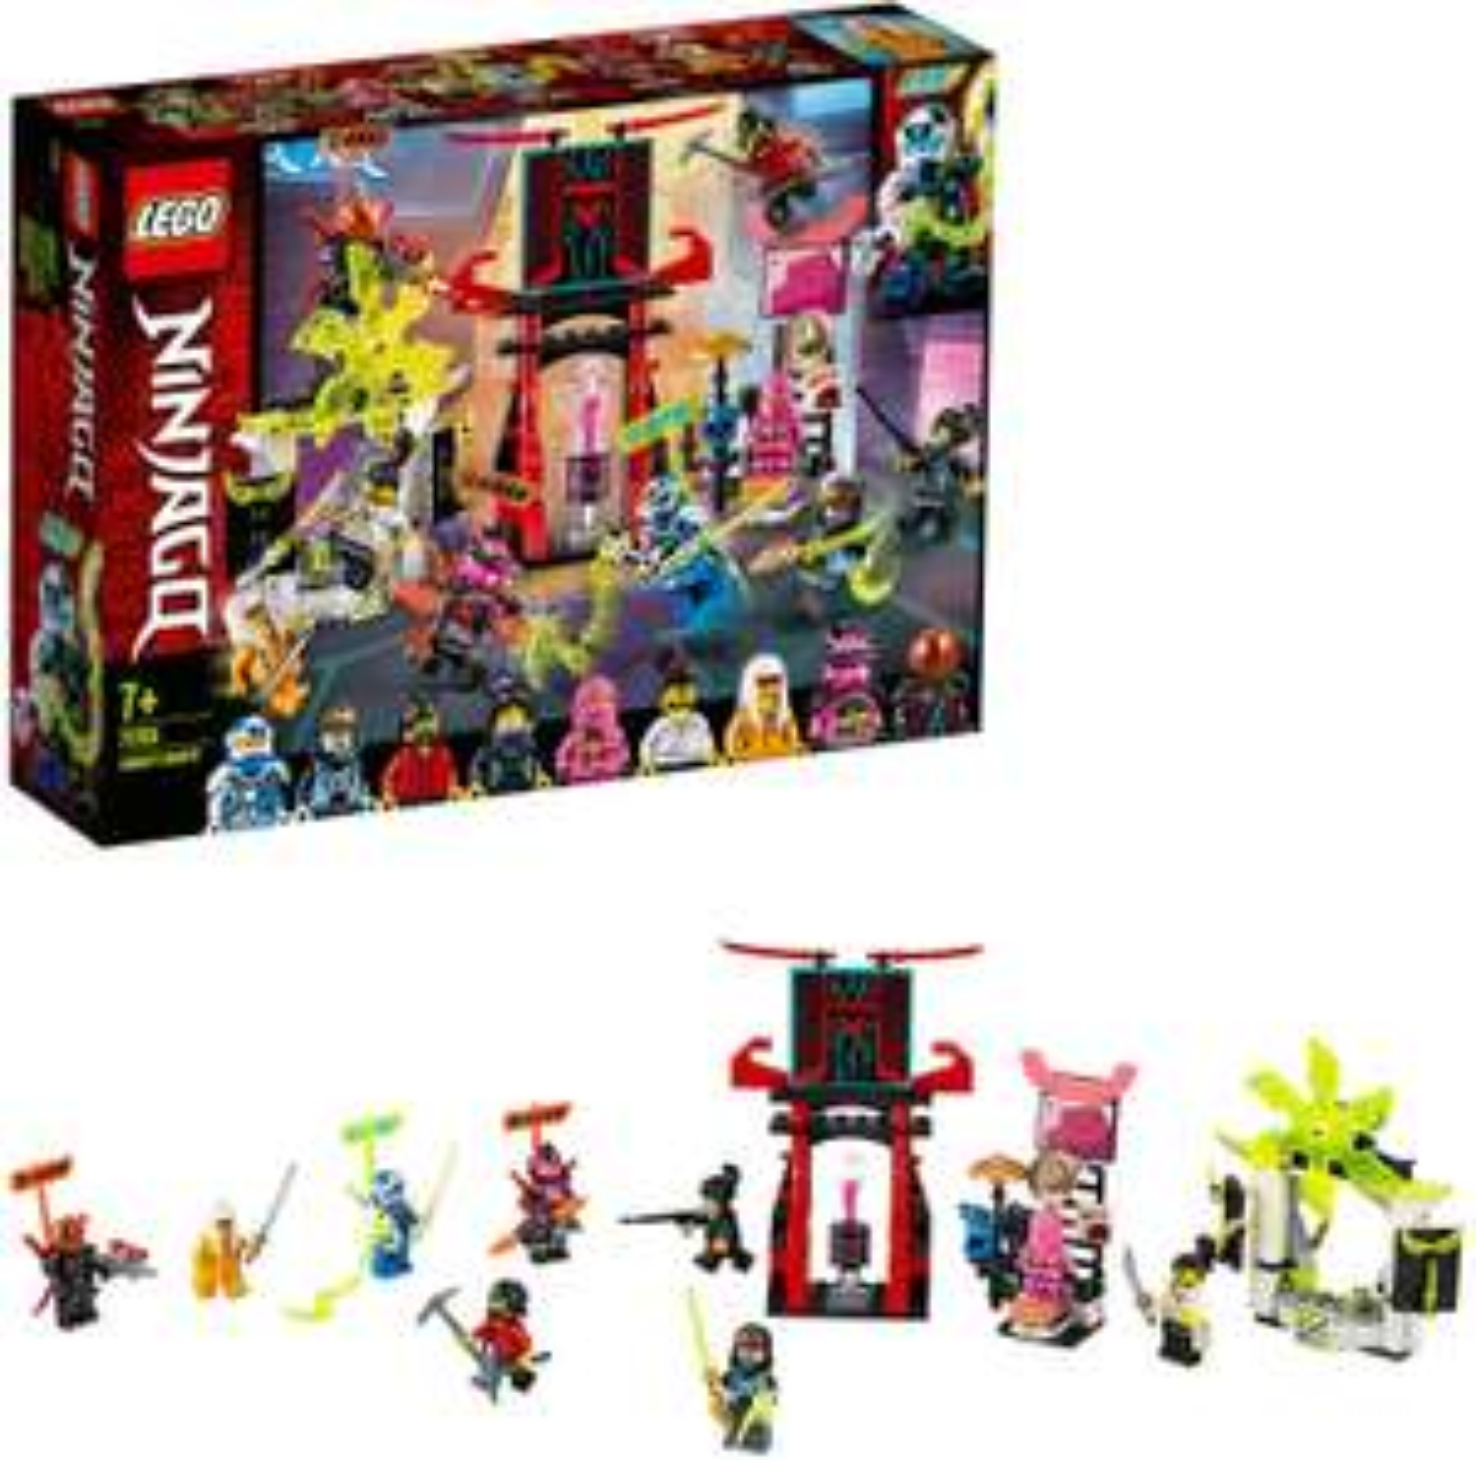 LEGO 71708 Ninjago Gamer's Market Nine Minifigures Set with Digi Jay, Avatar Pink - £23.99 delivered @ Amazon